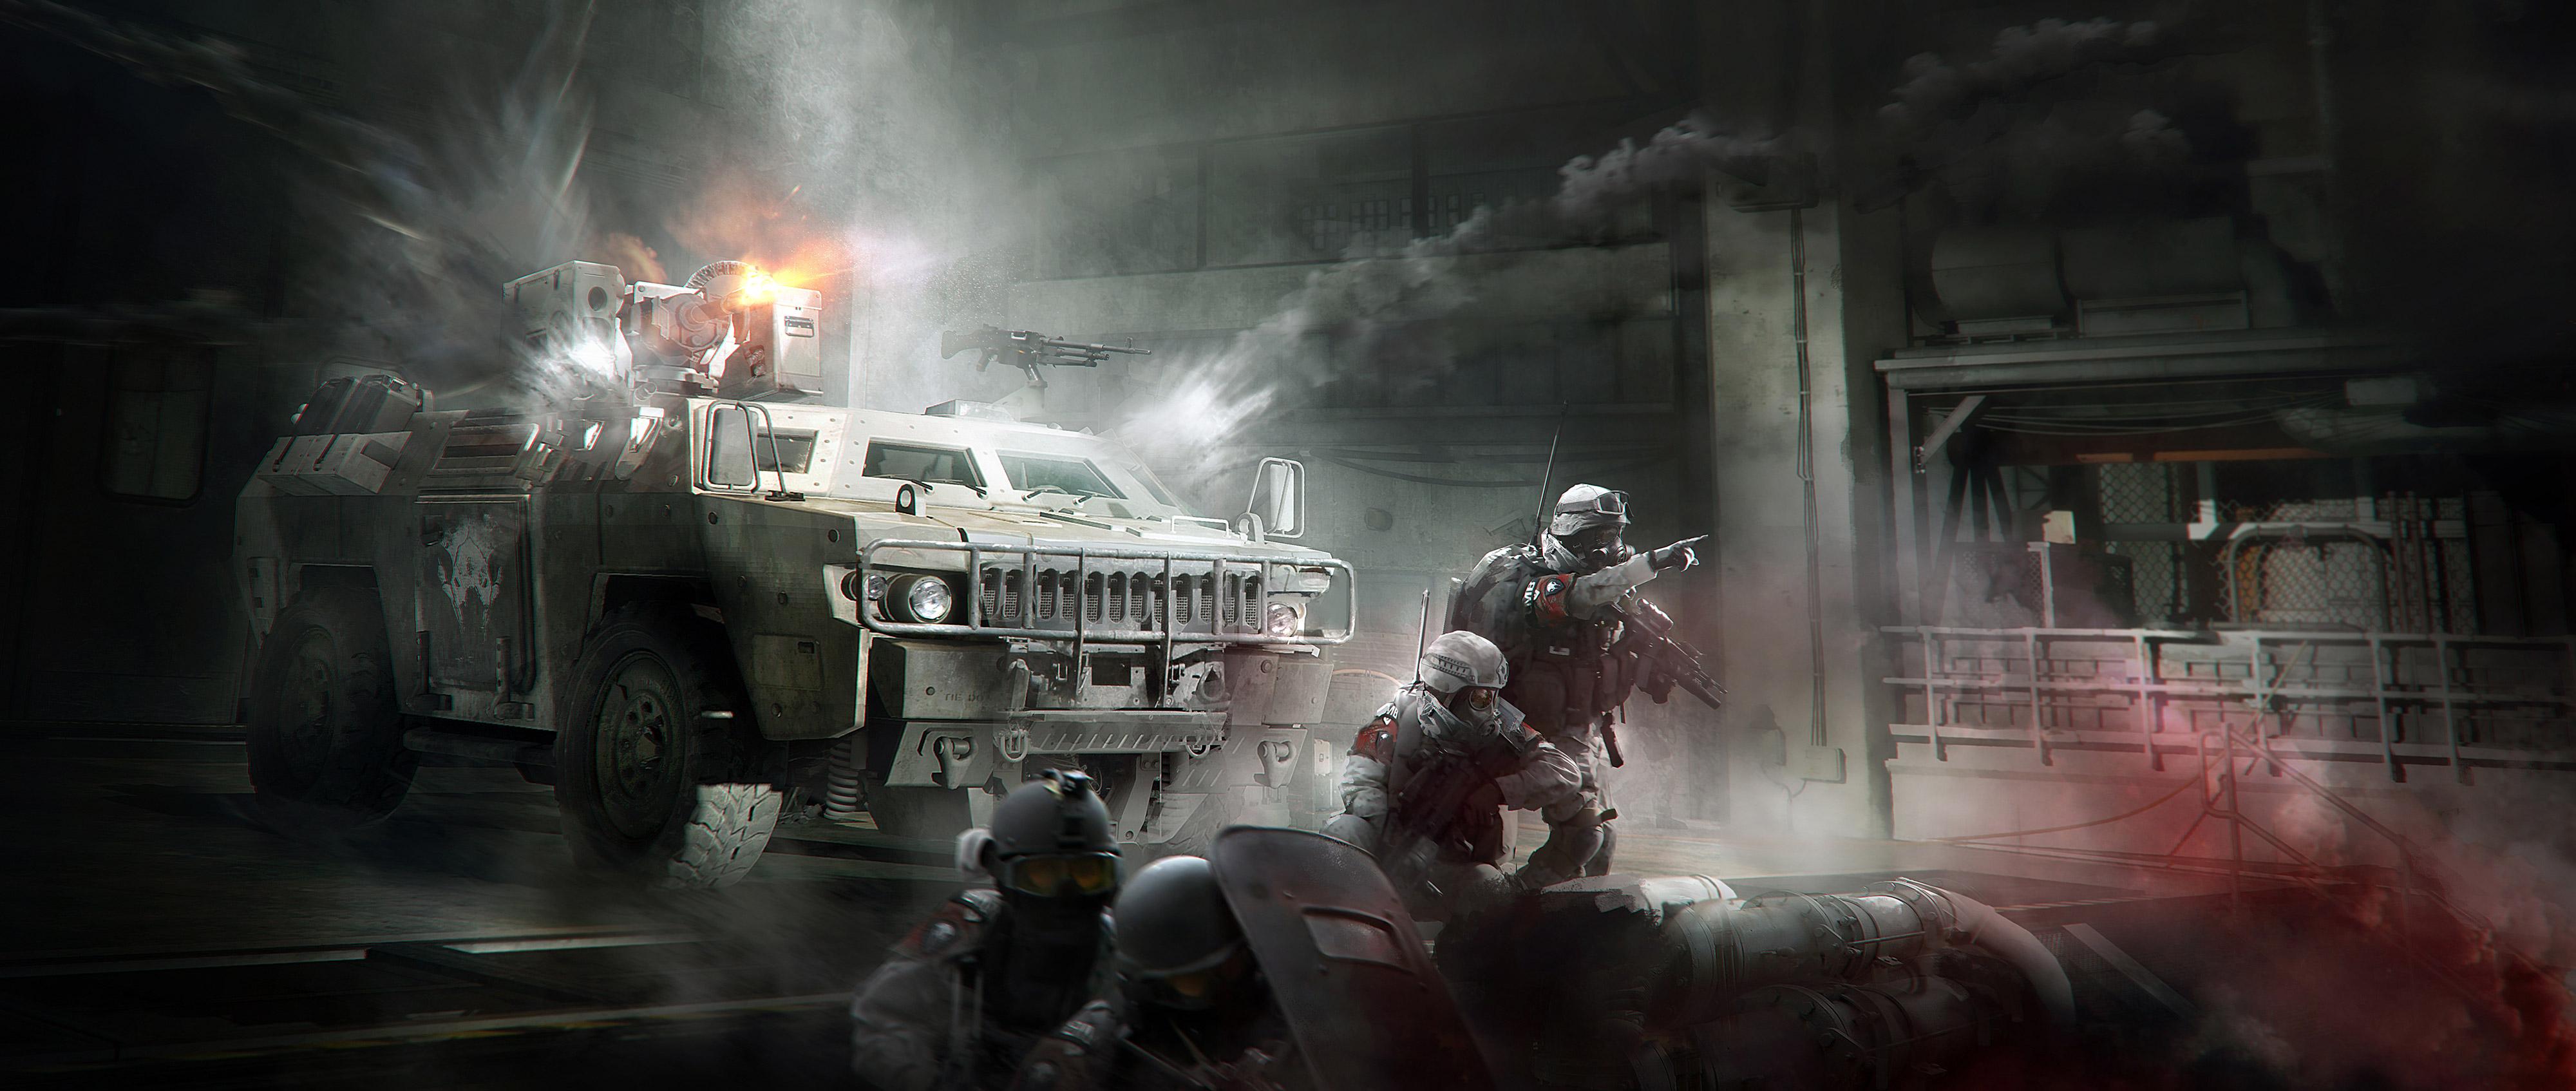 4k Tom Clancys Ghost Recon Wildlands Hd Games 4k Wallpapers